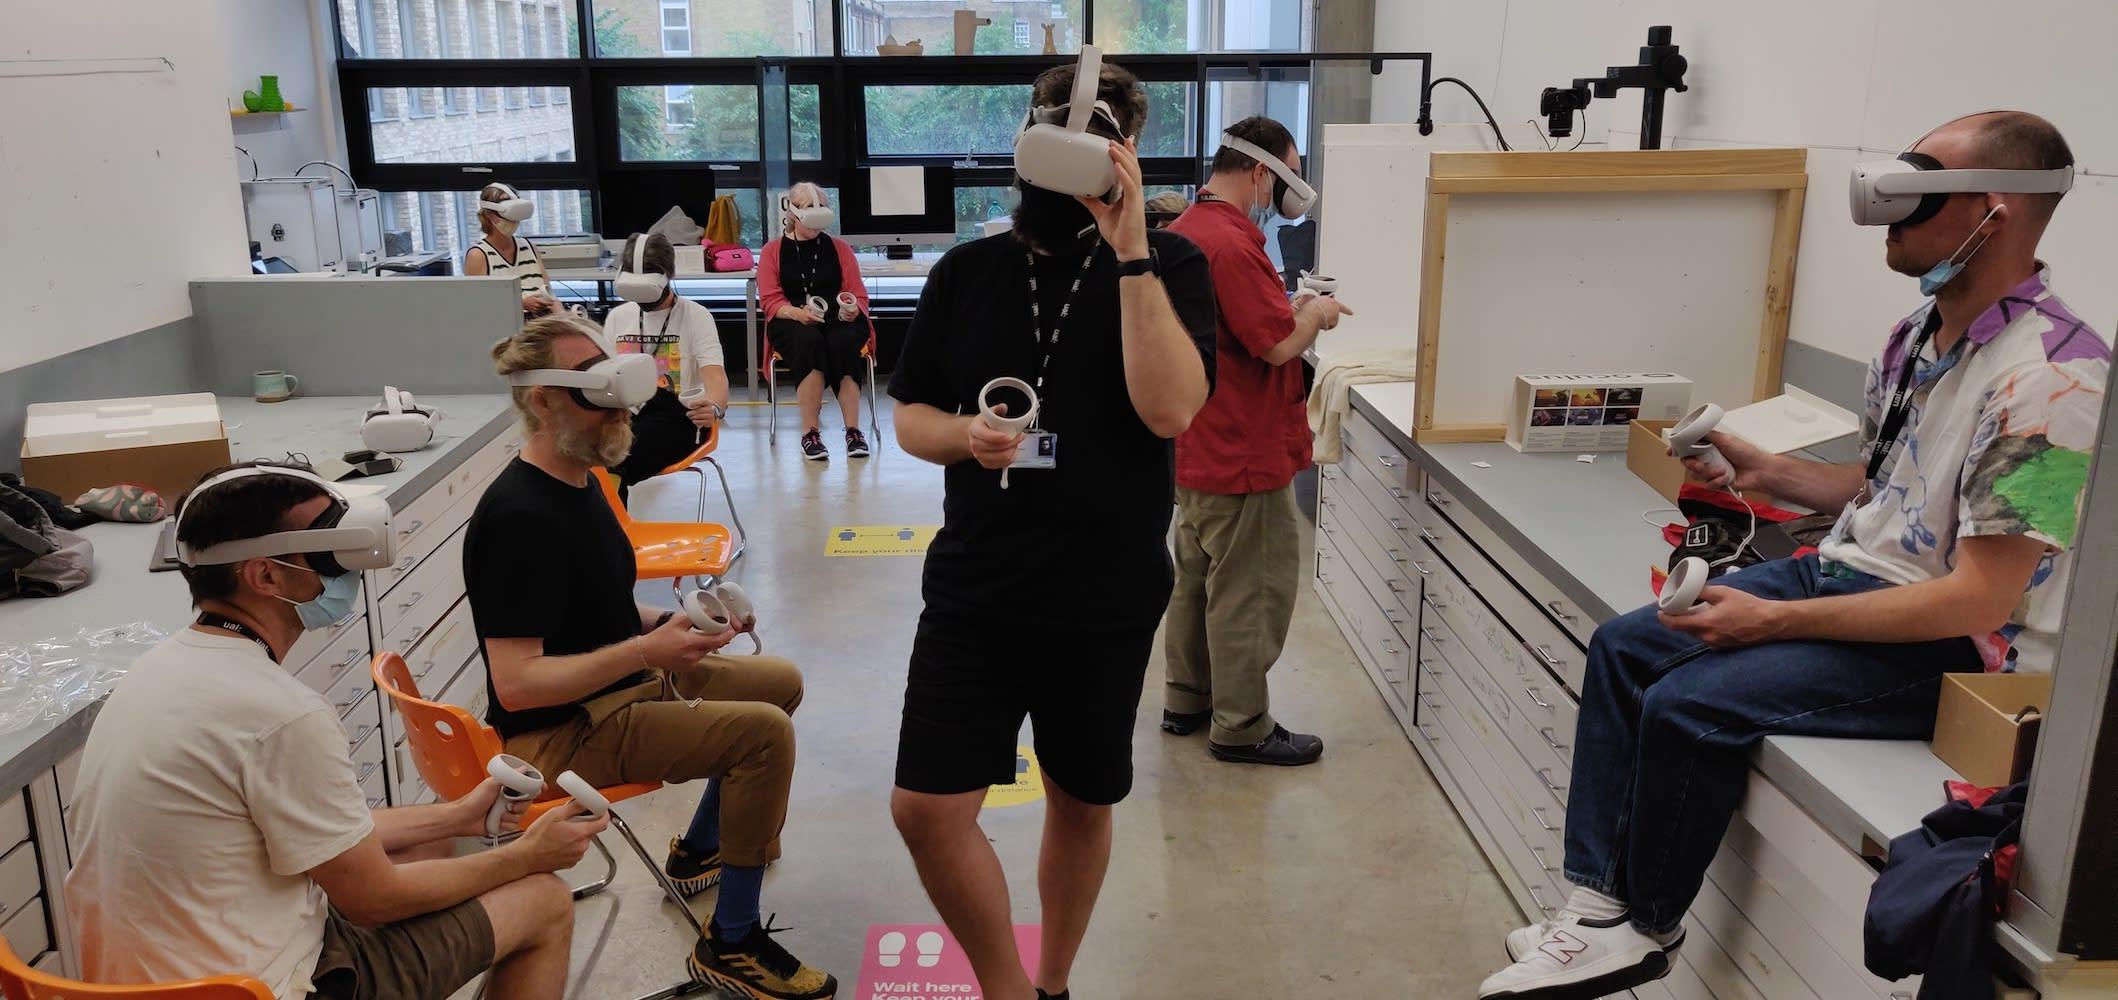 Camberwell-Illustration-staff-VR-workshop.jpg